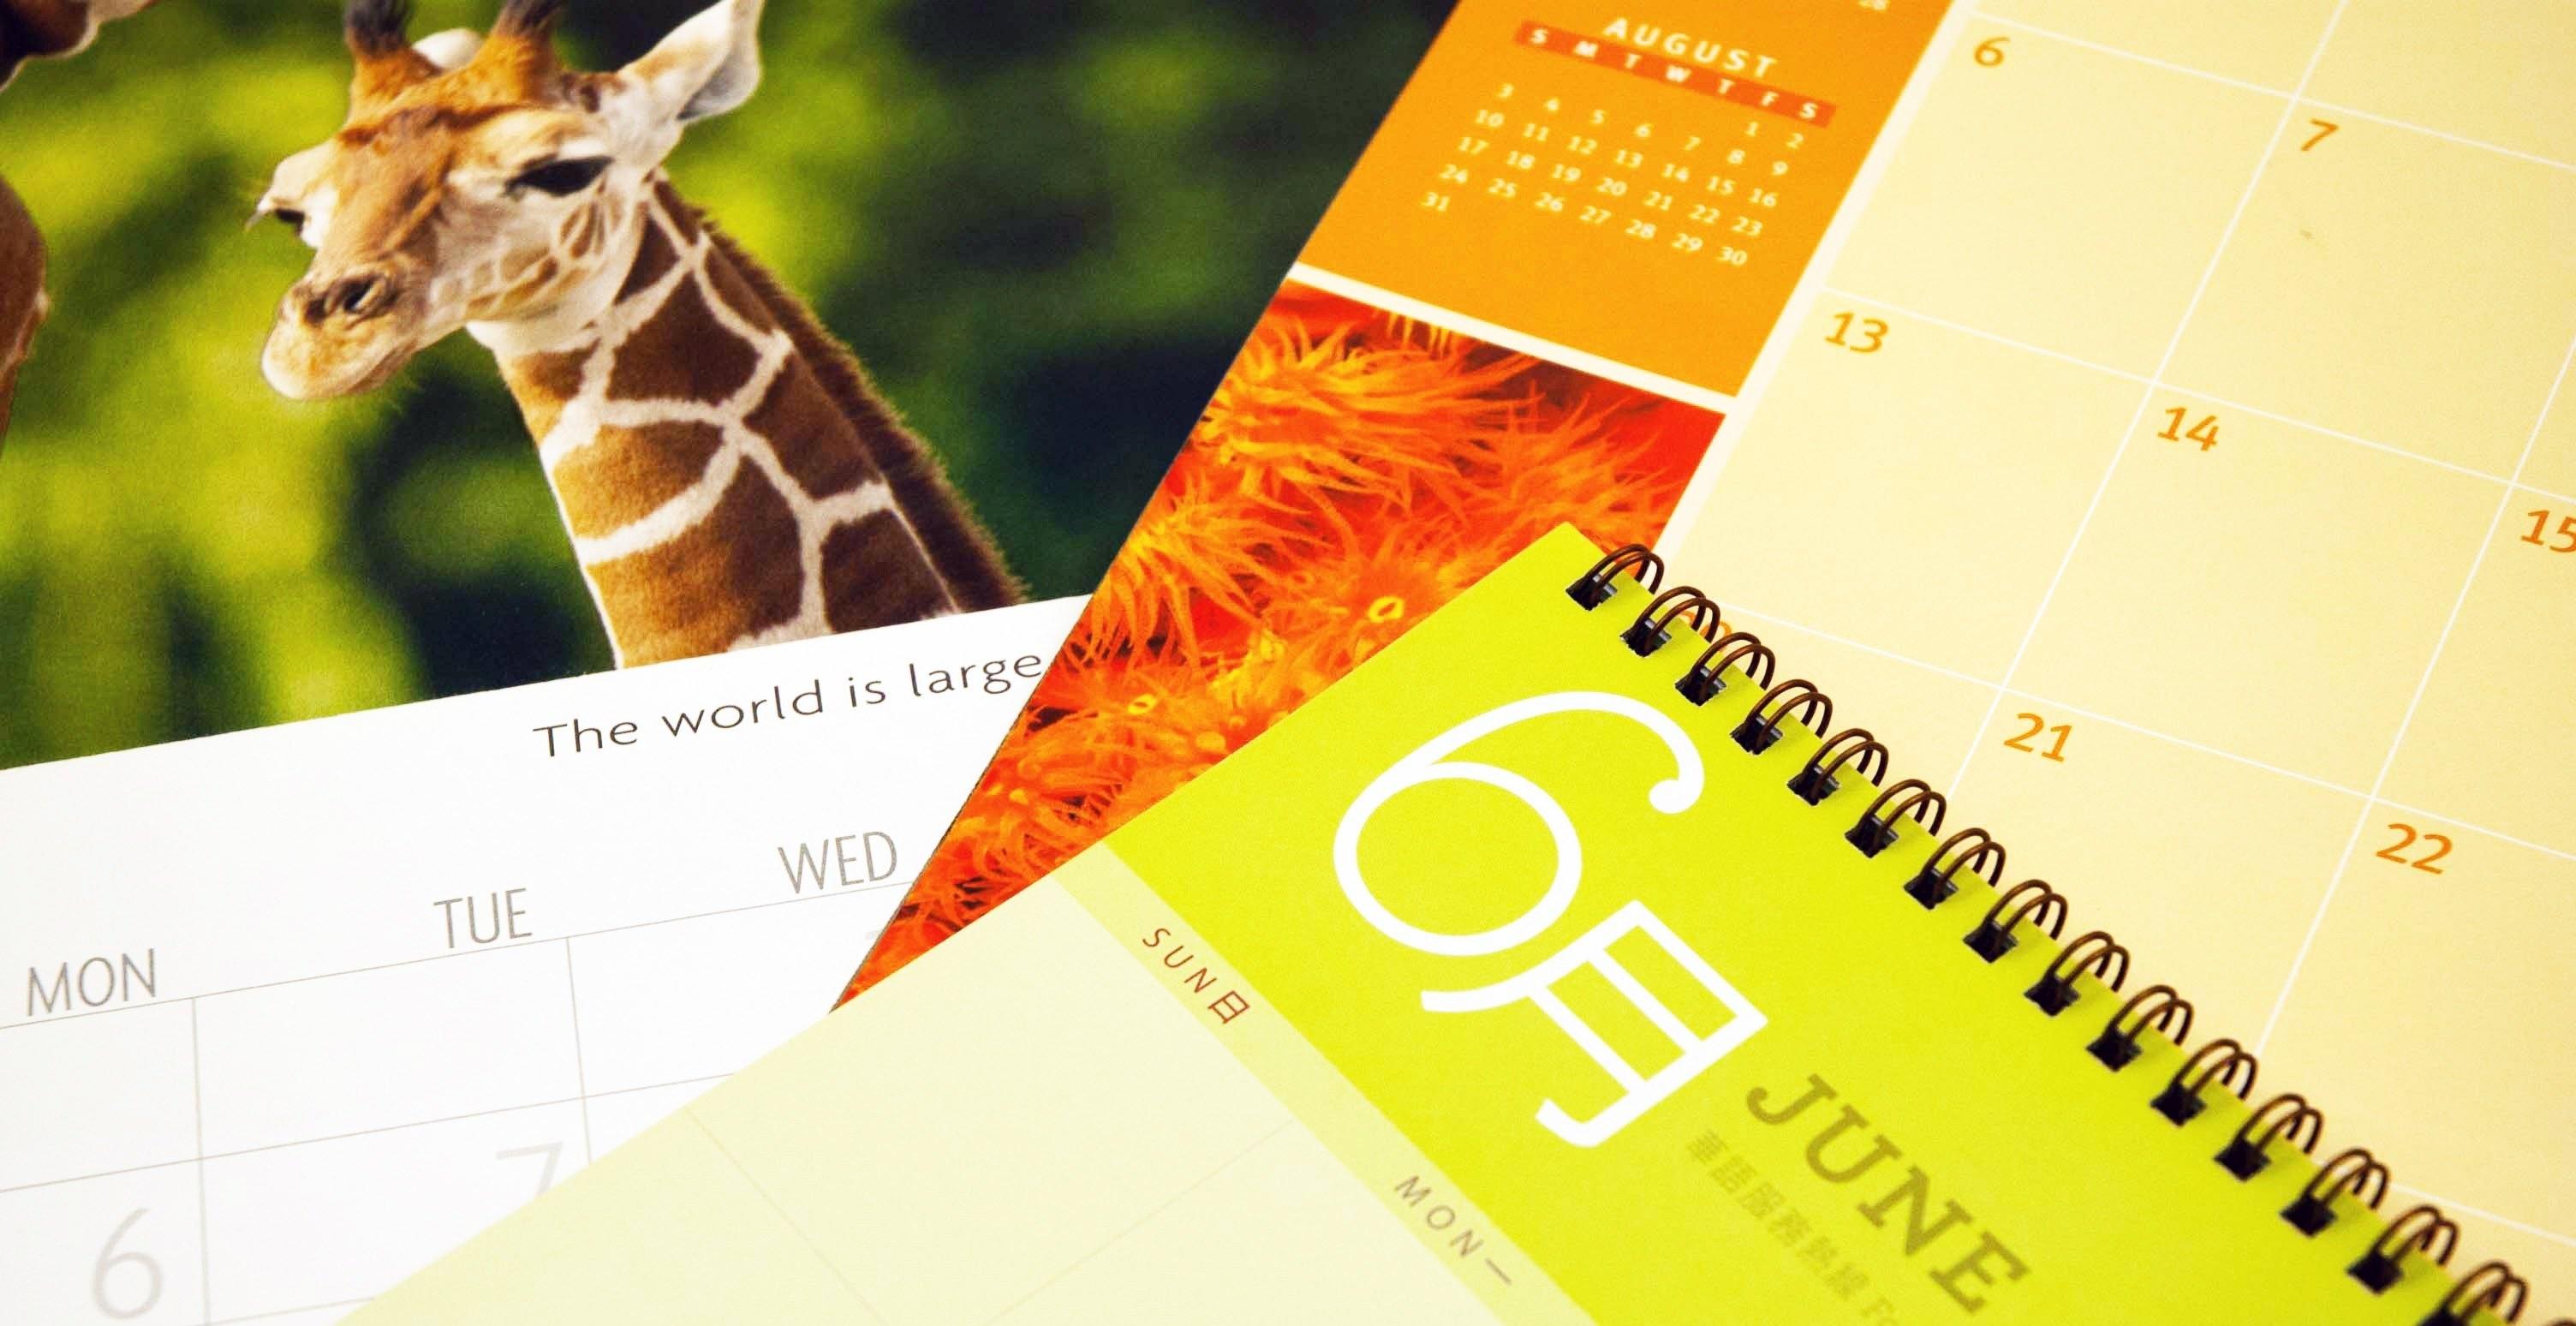 Calendar Printing Season Is Here - Don't Miss Your Deadline!